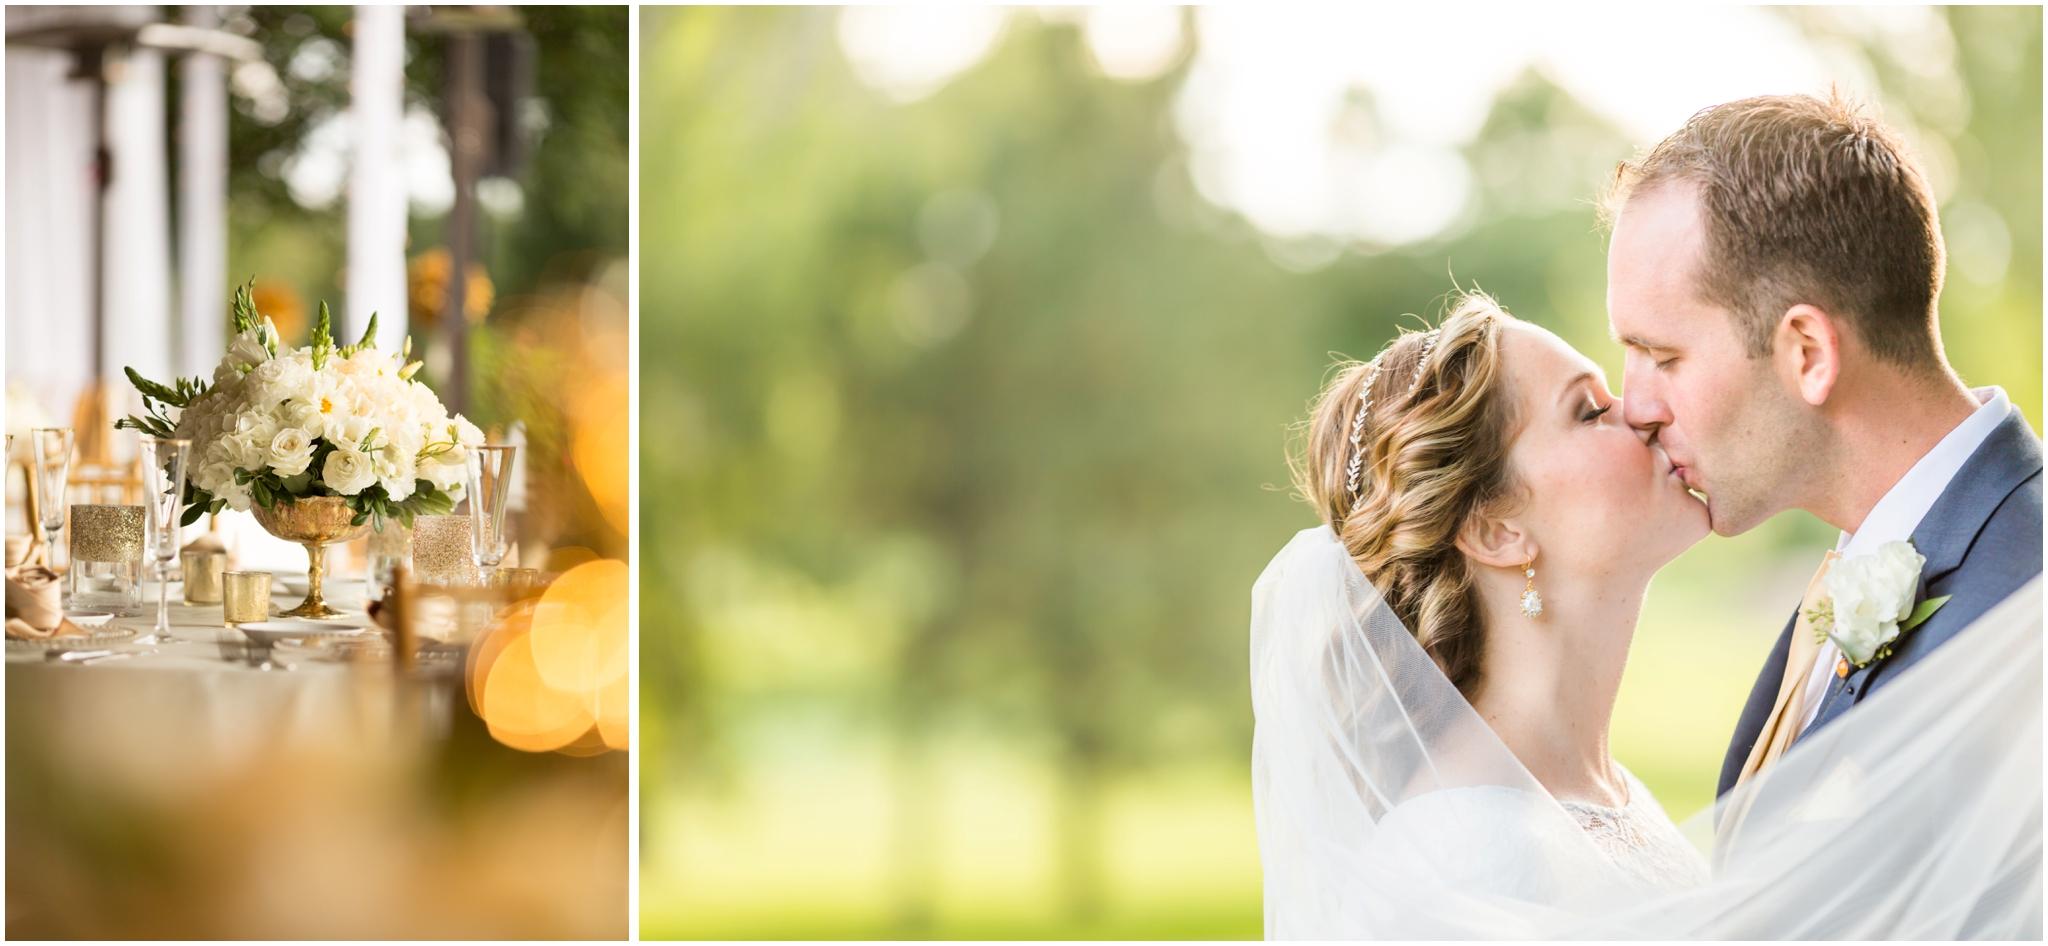 Denver Wedding Photographer.jpg